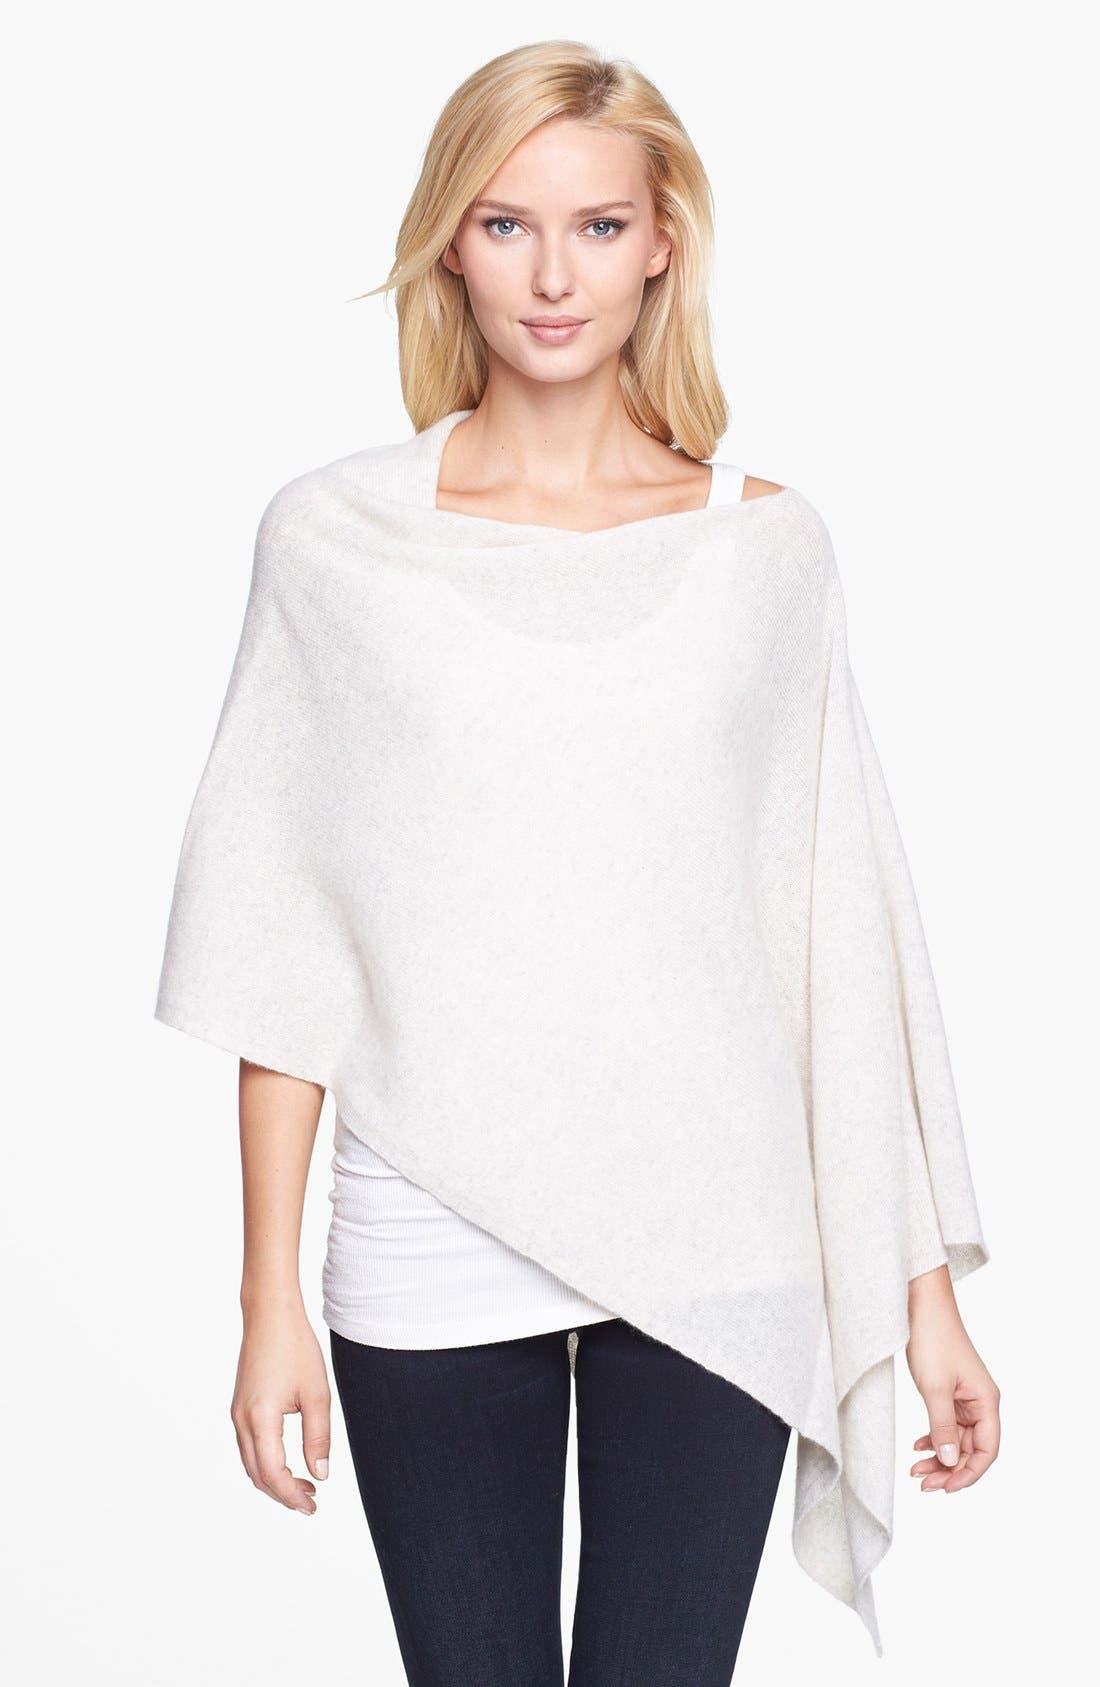 Alternate Image 1 Selected - White + Warren Asymmetrical Cashmere Poncho